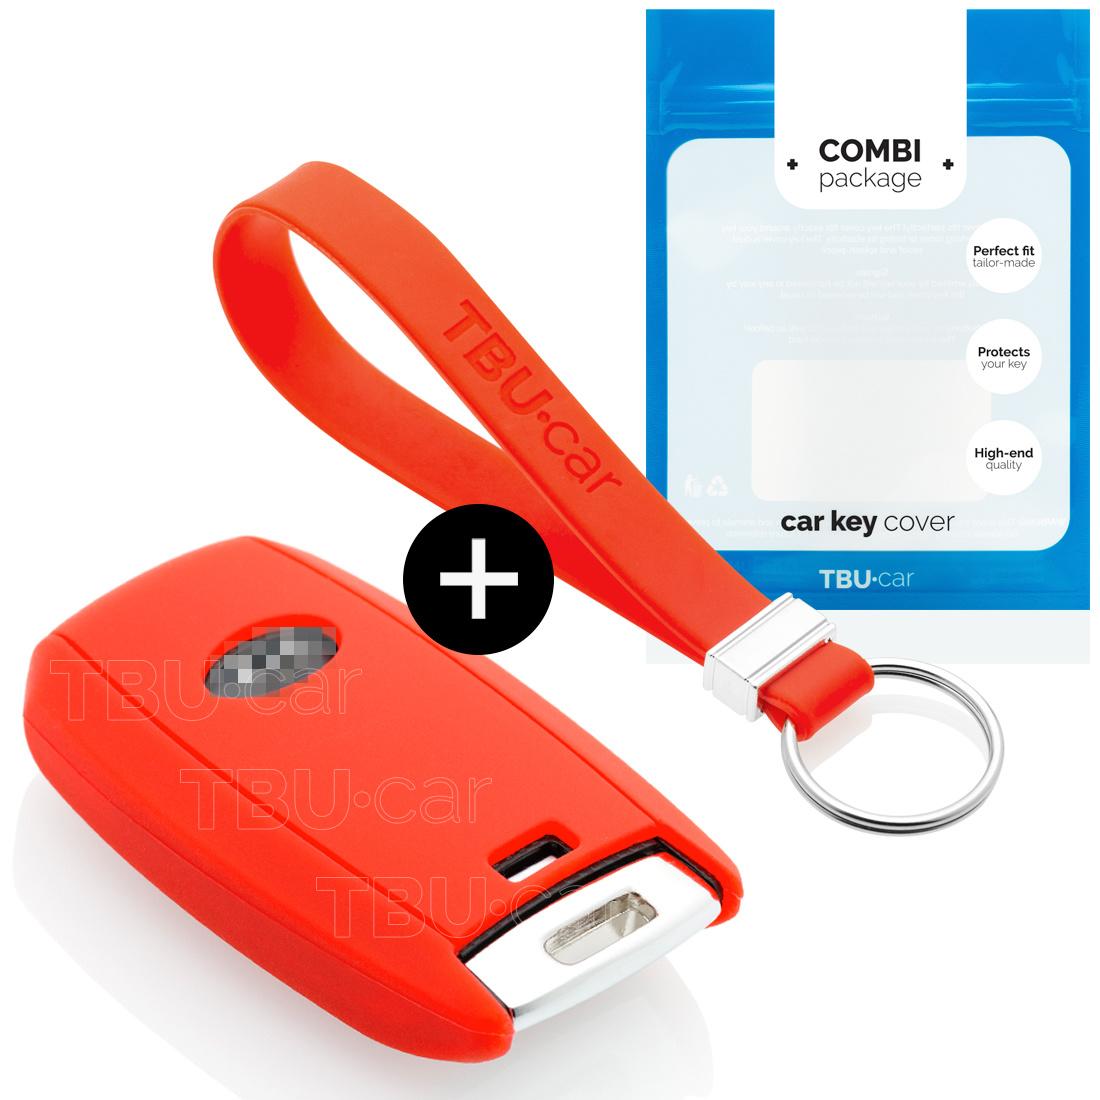 TBU car TBU car Autoschlüssel Hülle kompatibel mit Kia 3 Tasten (Keyless Entry) - Schutzhülle aus Silikon - Auto Schlüsselhülle Cover in Rot